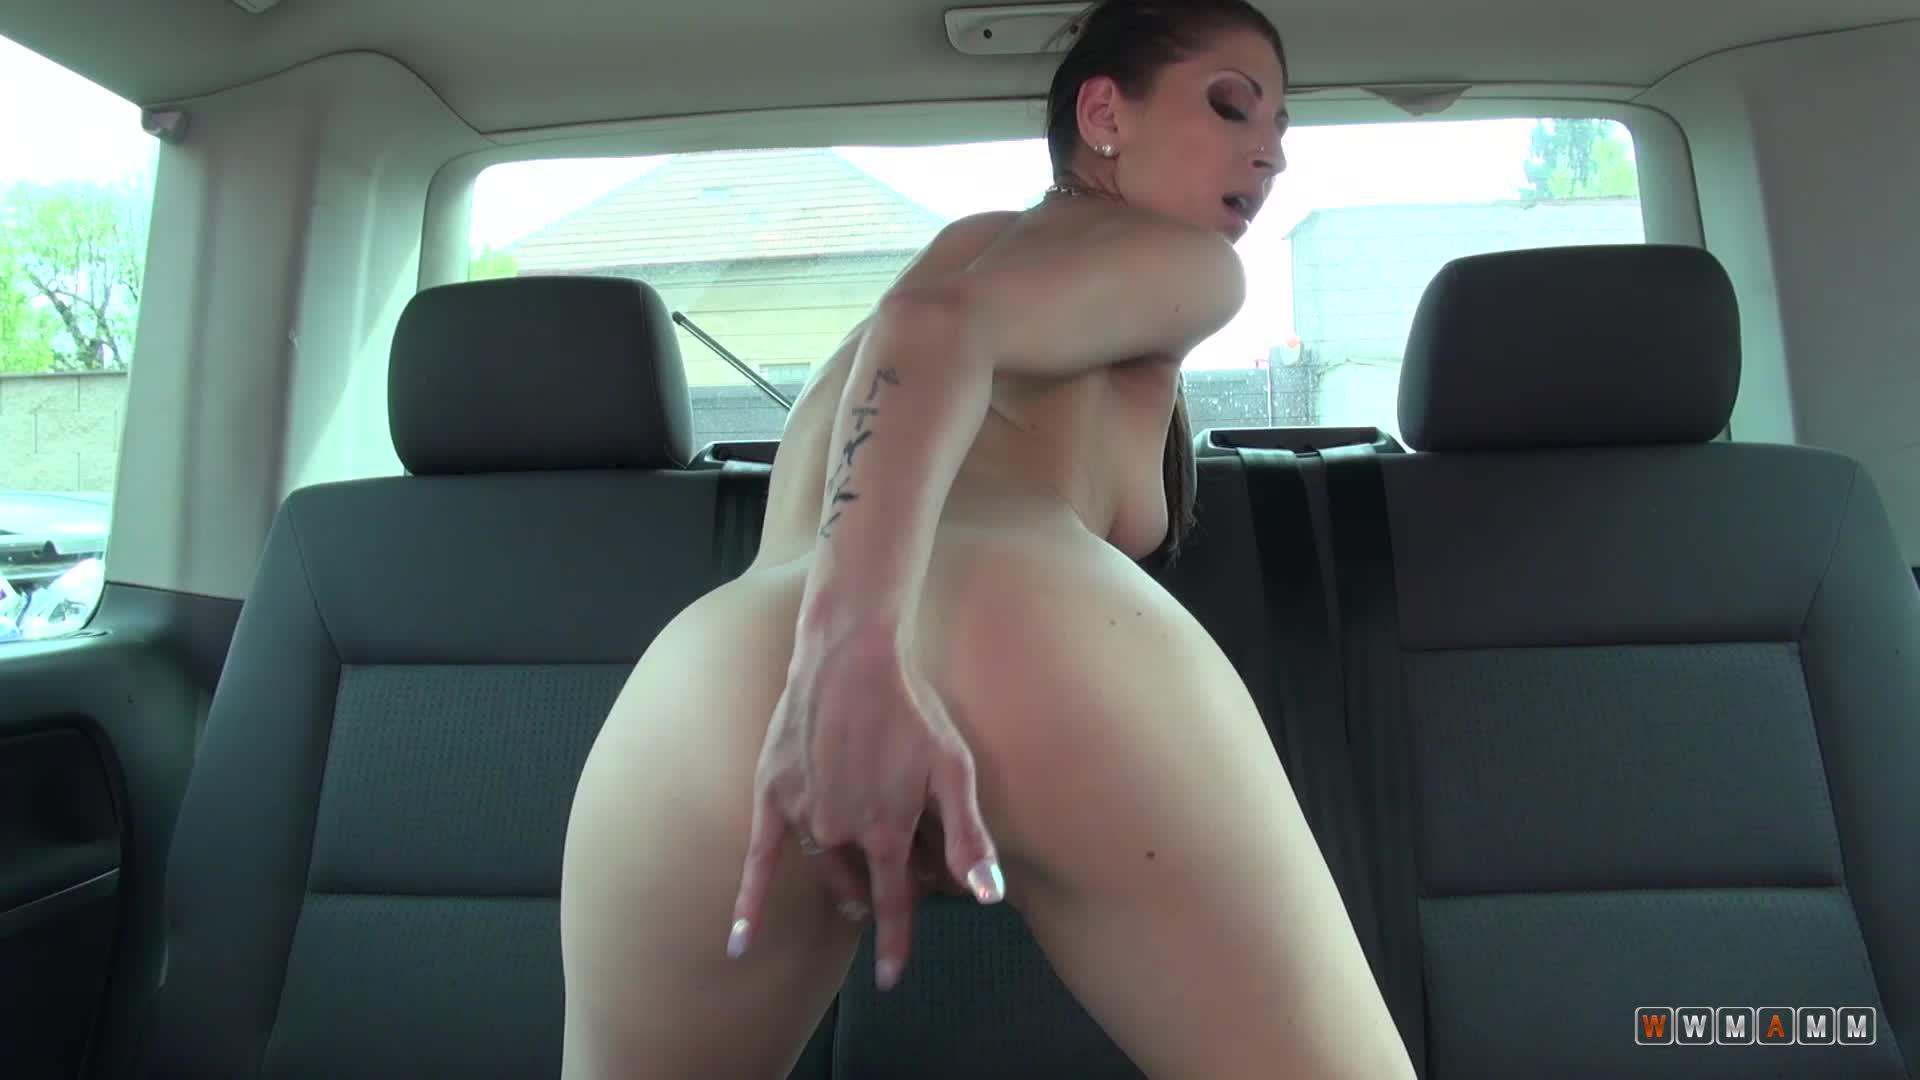 Slim Hottie Monica Fingers Her Soaking Wet Pussy From Behind